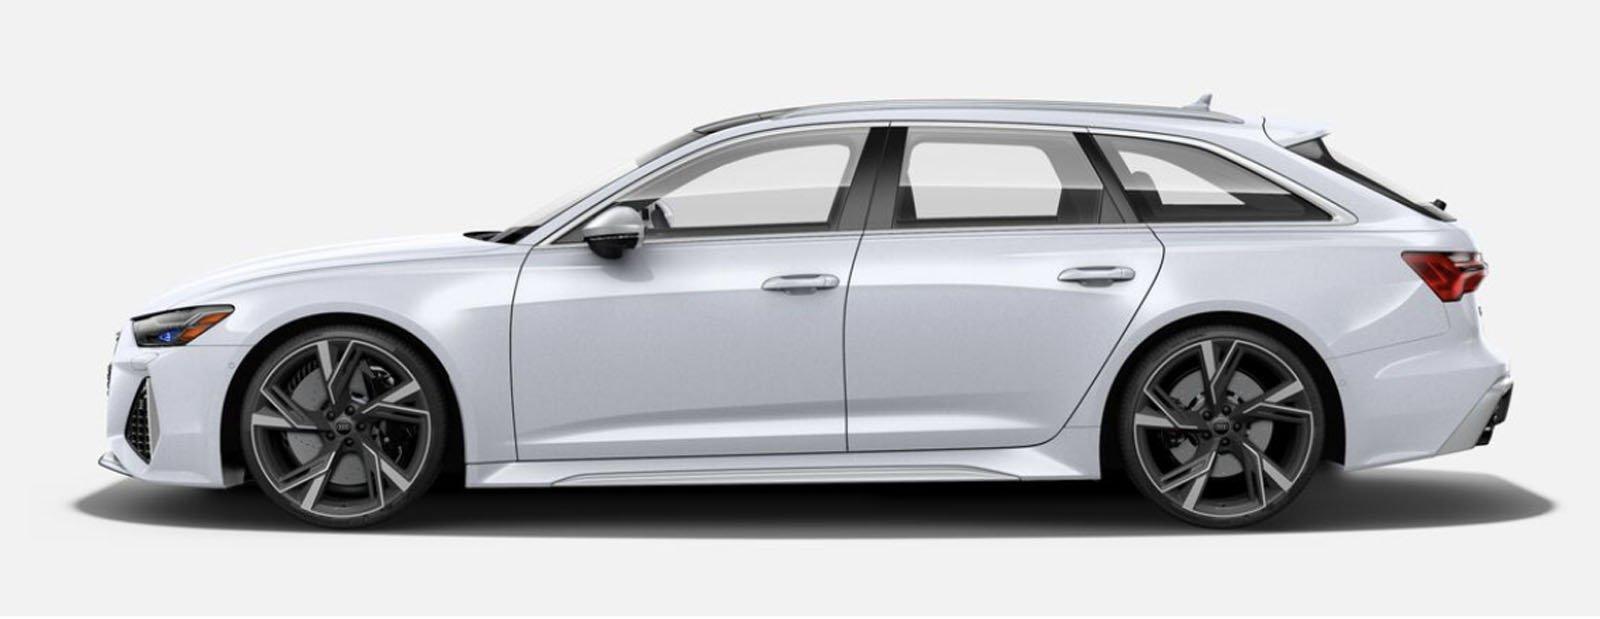 2021 Audi RS 6 Avant Glacier White